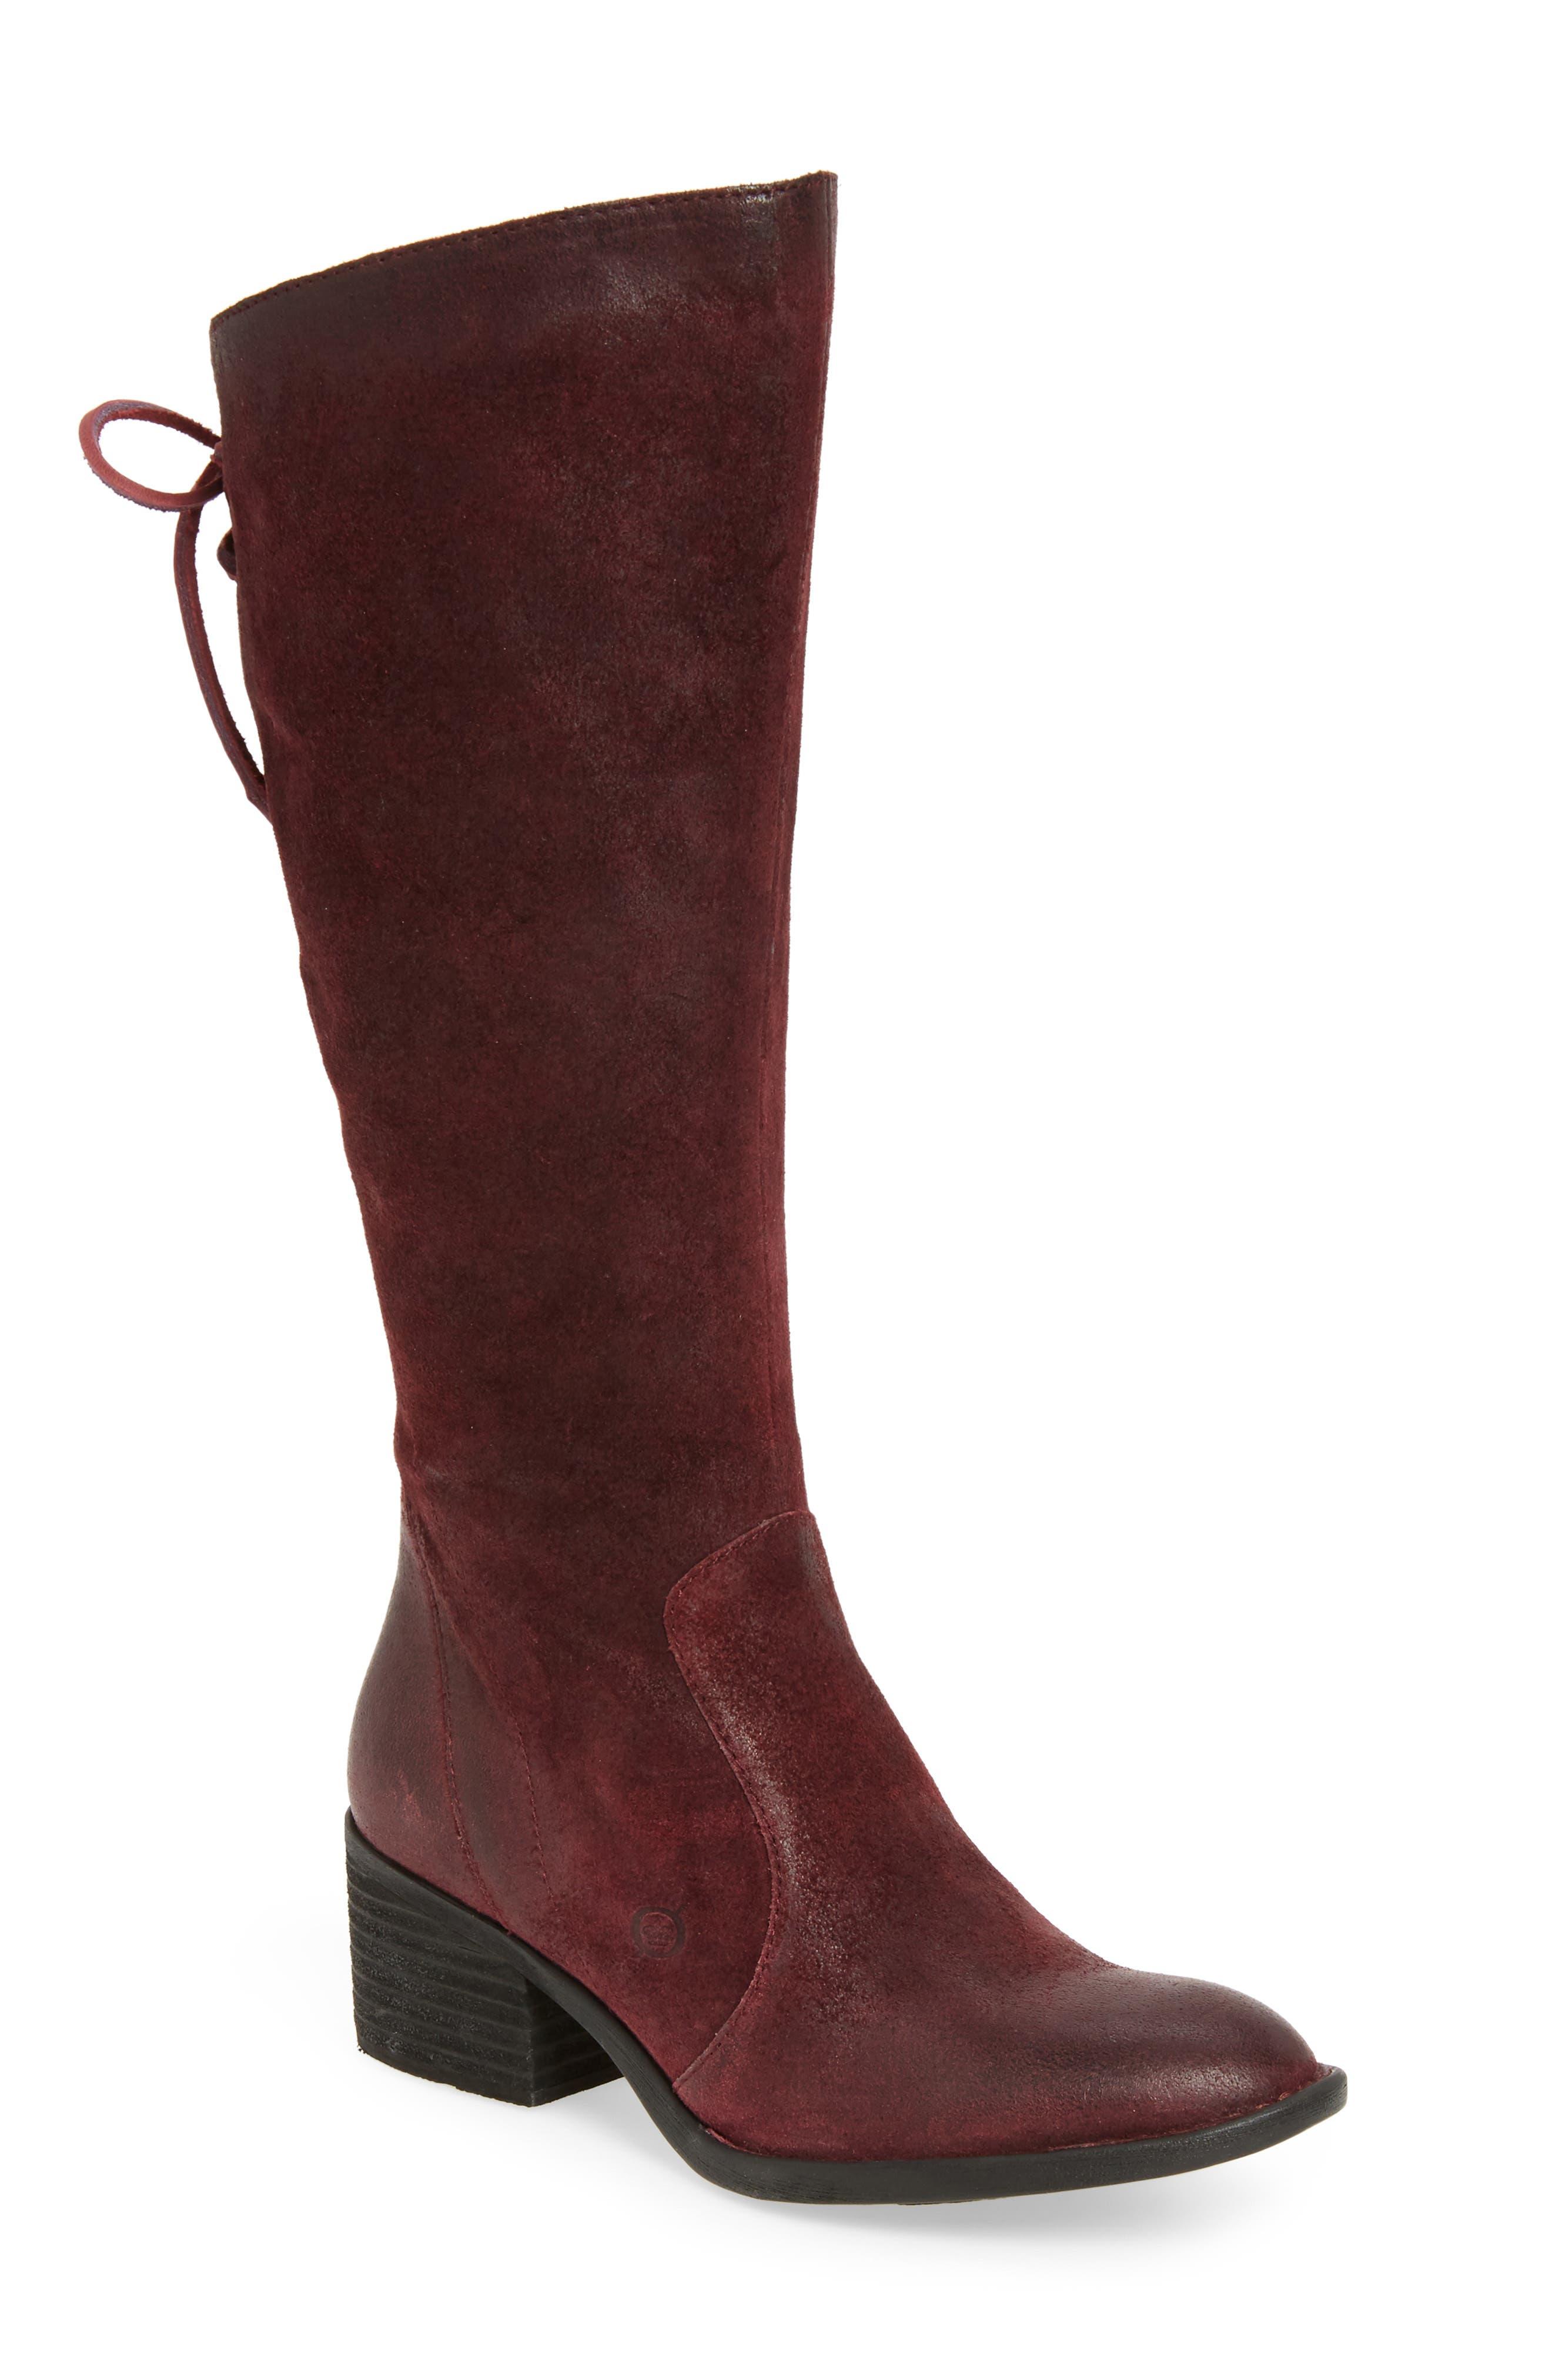 Alternate Image 1 Selected - Børn Felicia Knee High Boot (Women) (Regular & Wide Calf)